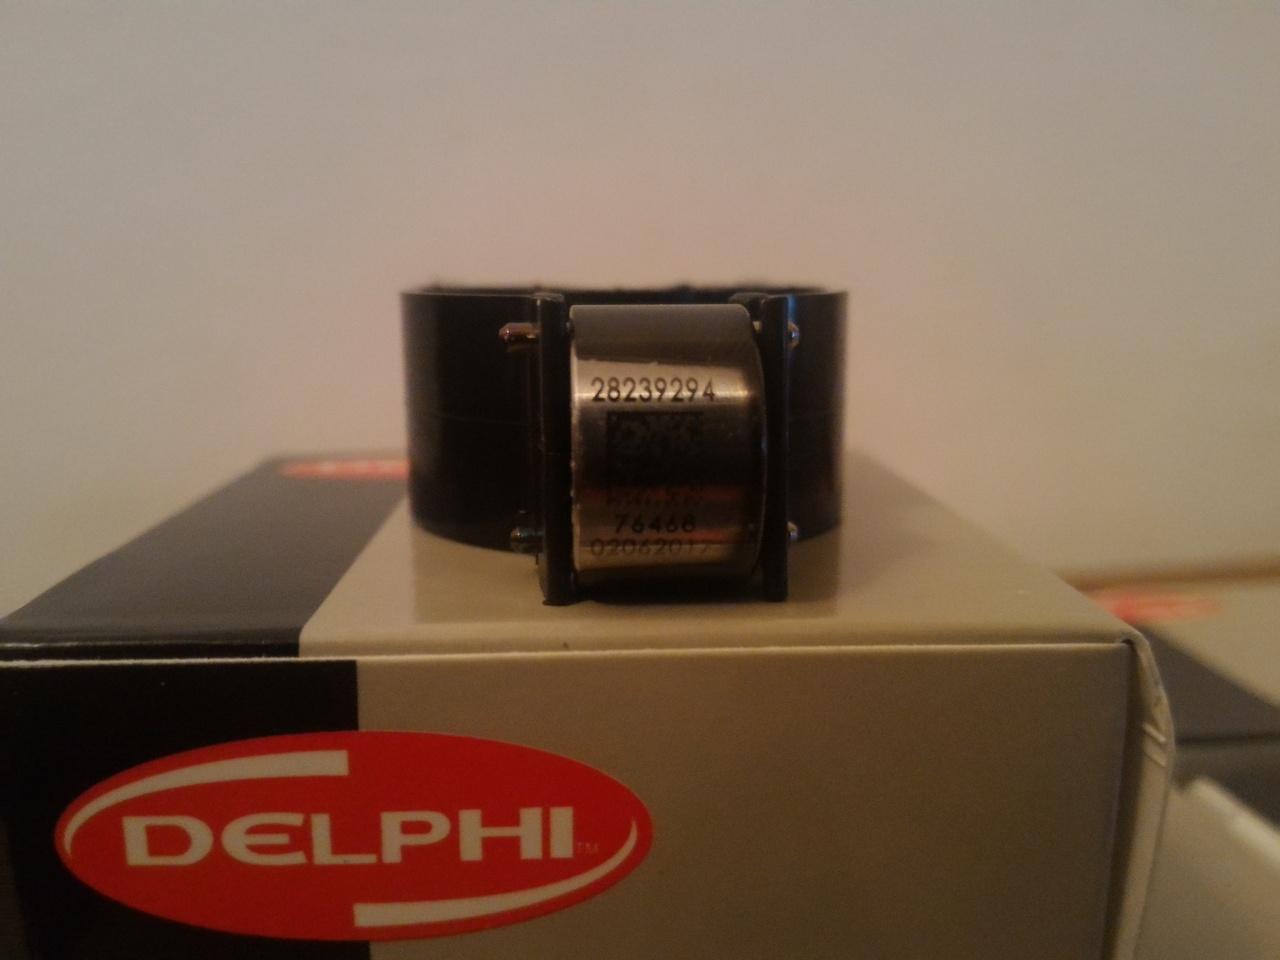 Supape retur injector Delphi cod 28239294 originale -Transport inclus